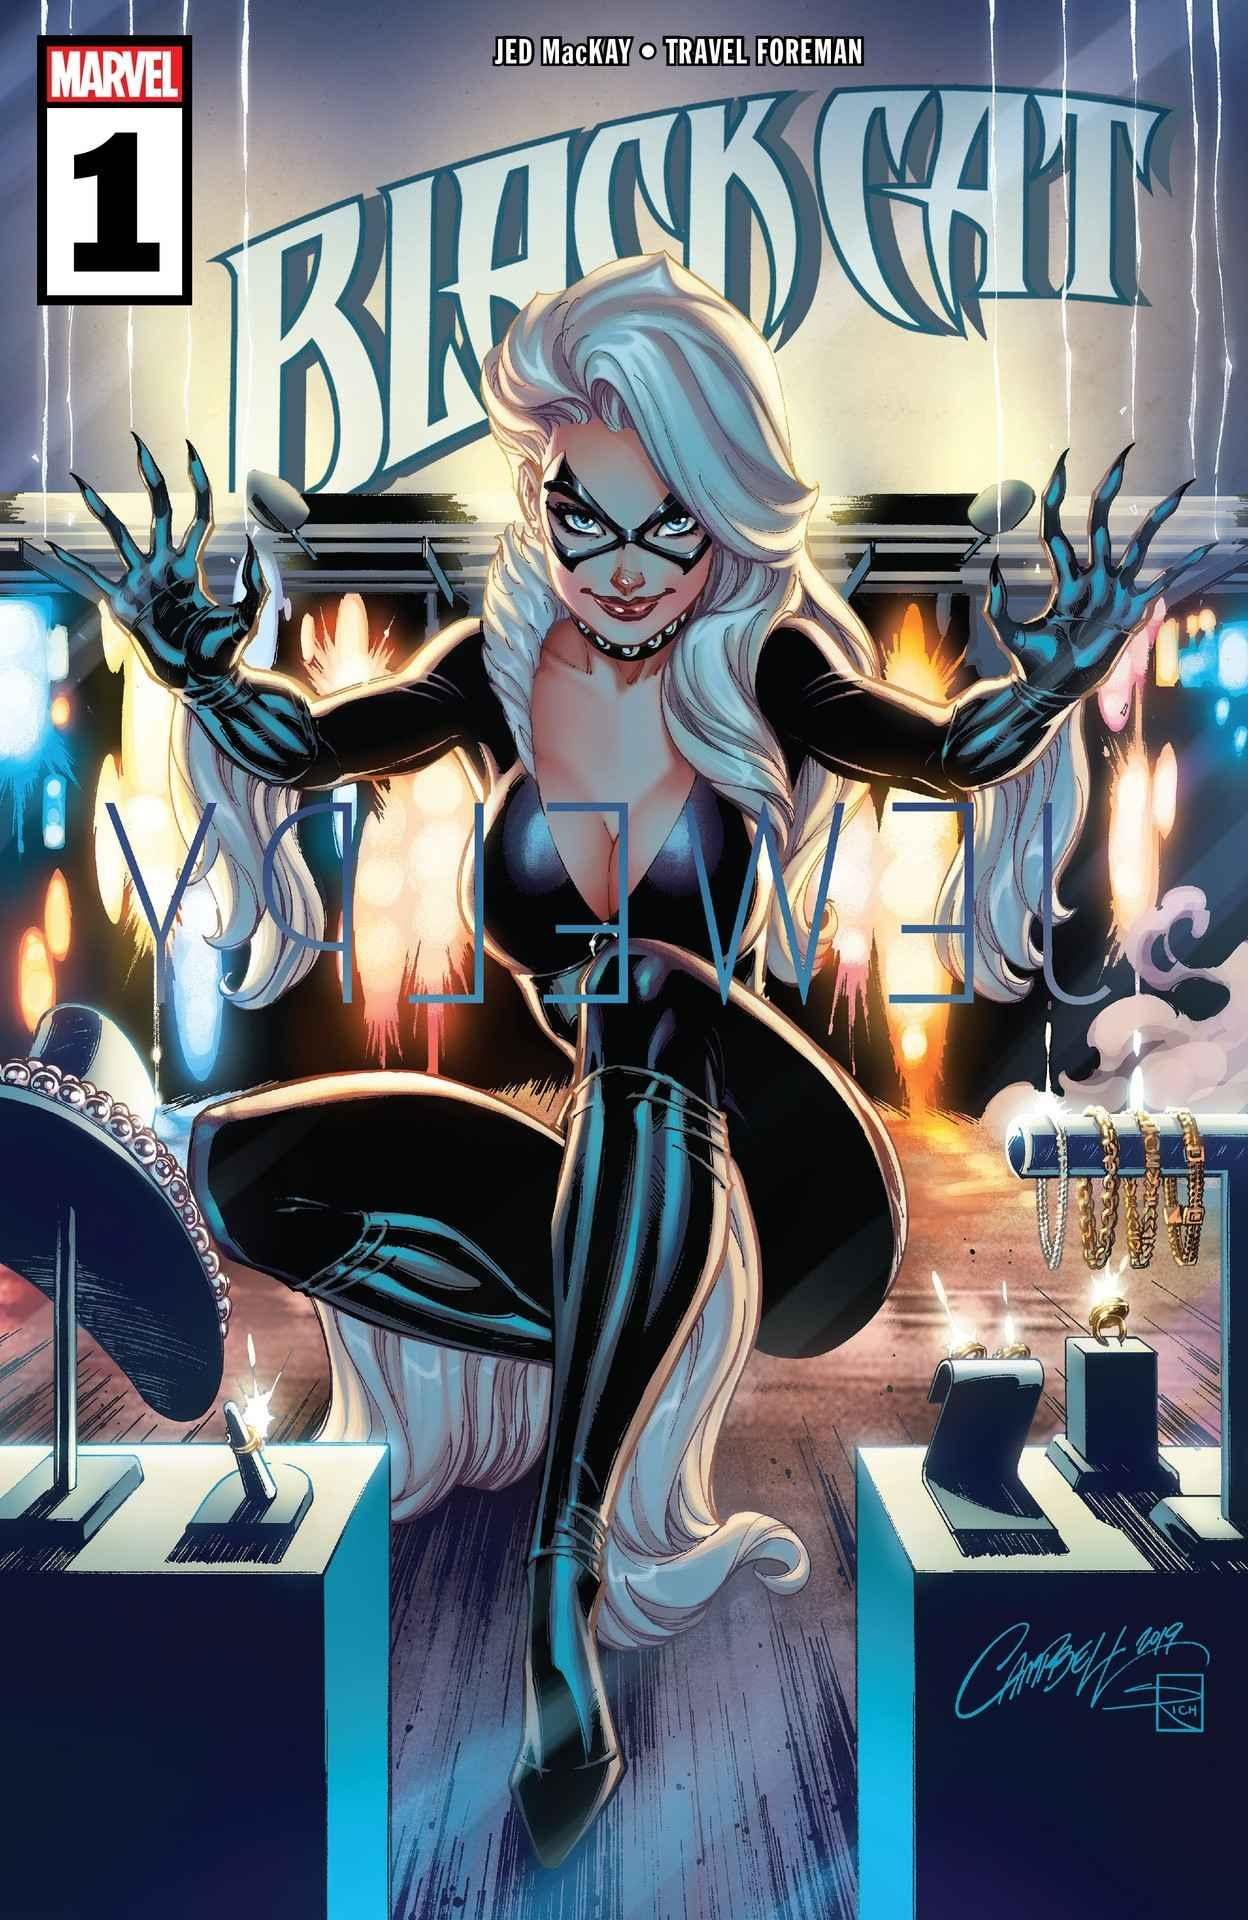 Best Comics of 2019: Black Cat